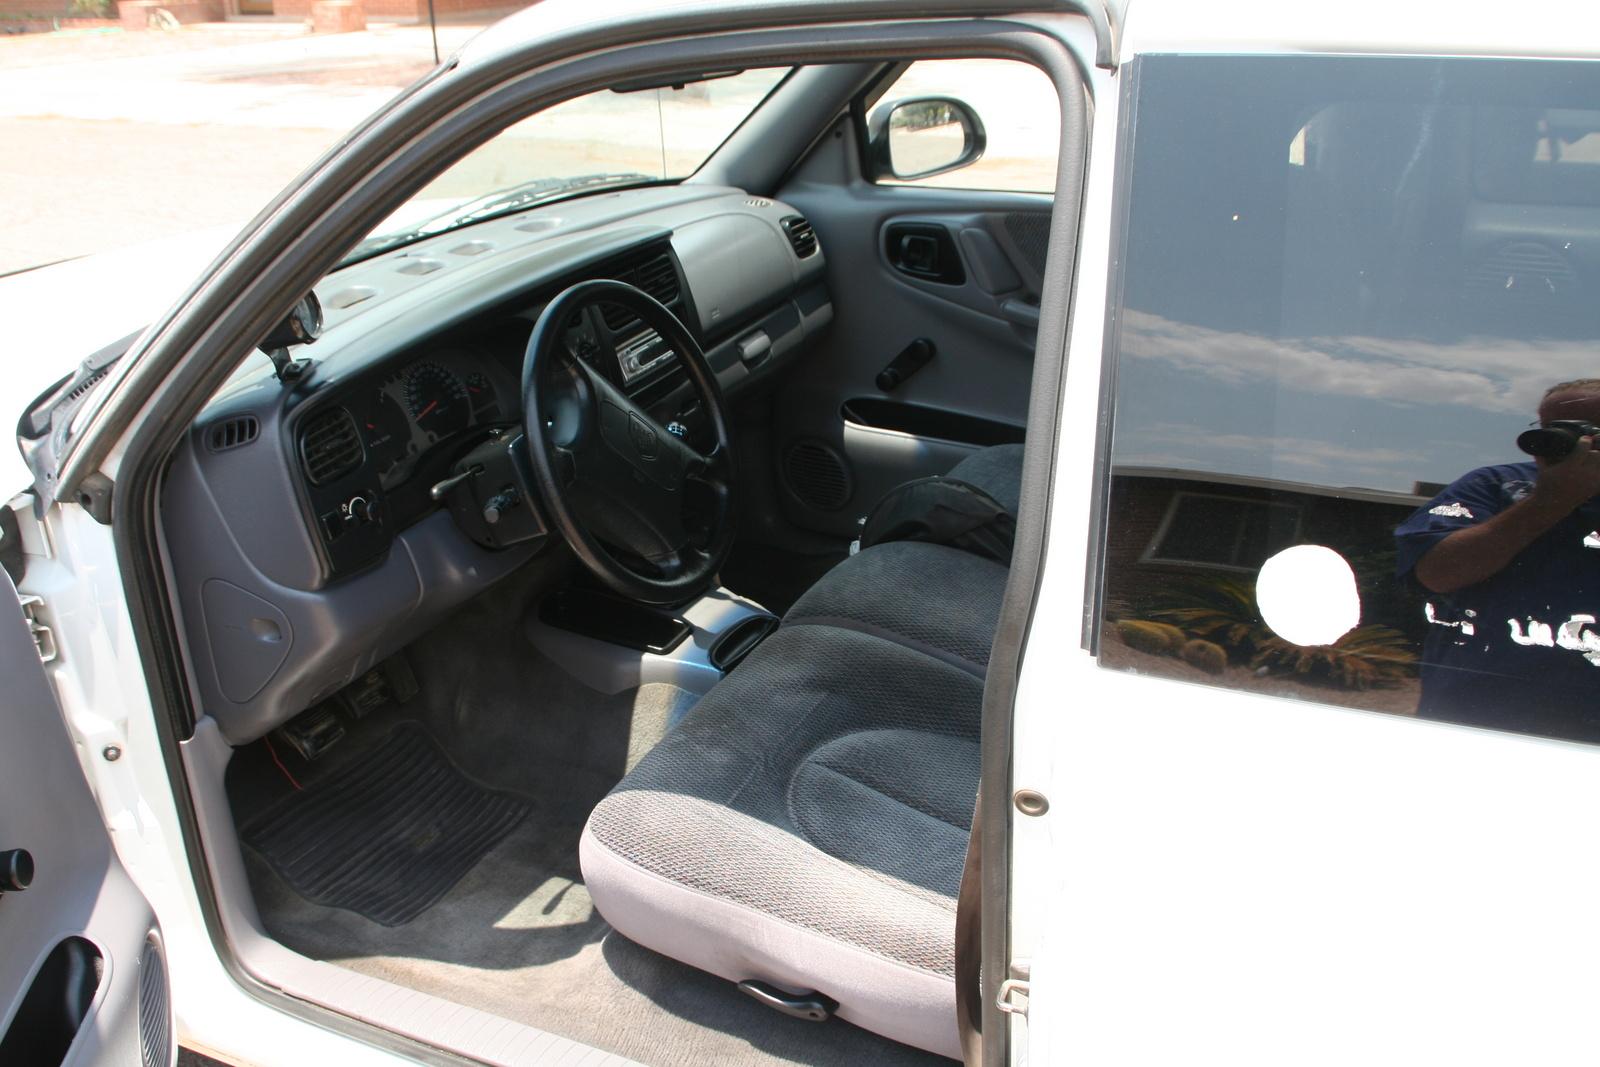 Dodge Dakota Dr Sport Extended Cab Sb Pic on 1993 Dodge Dakota Repairs